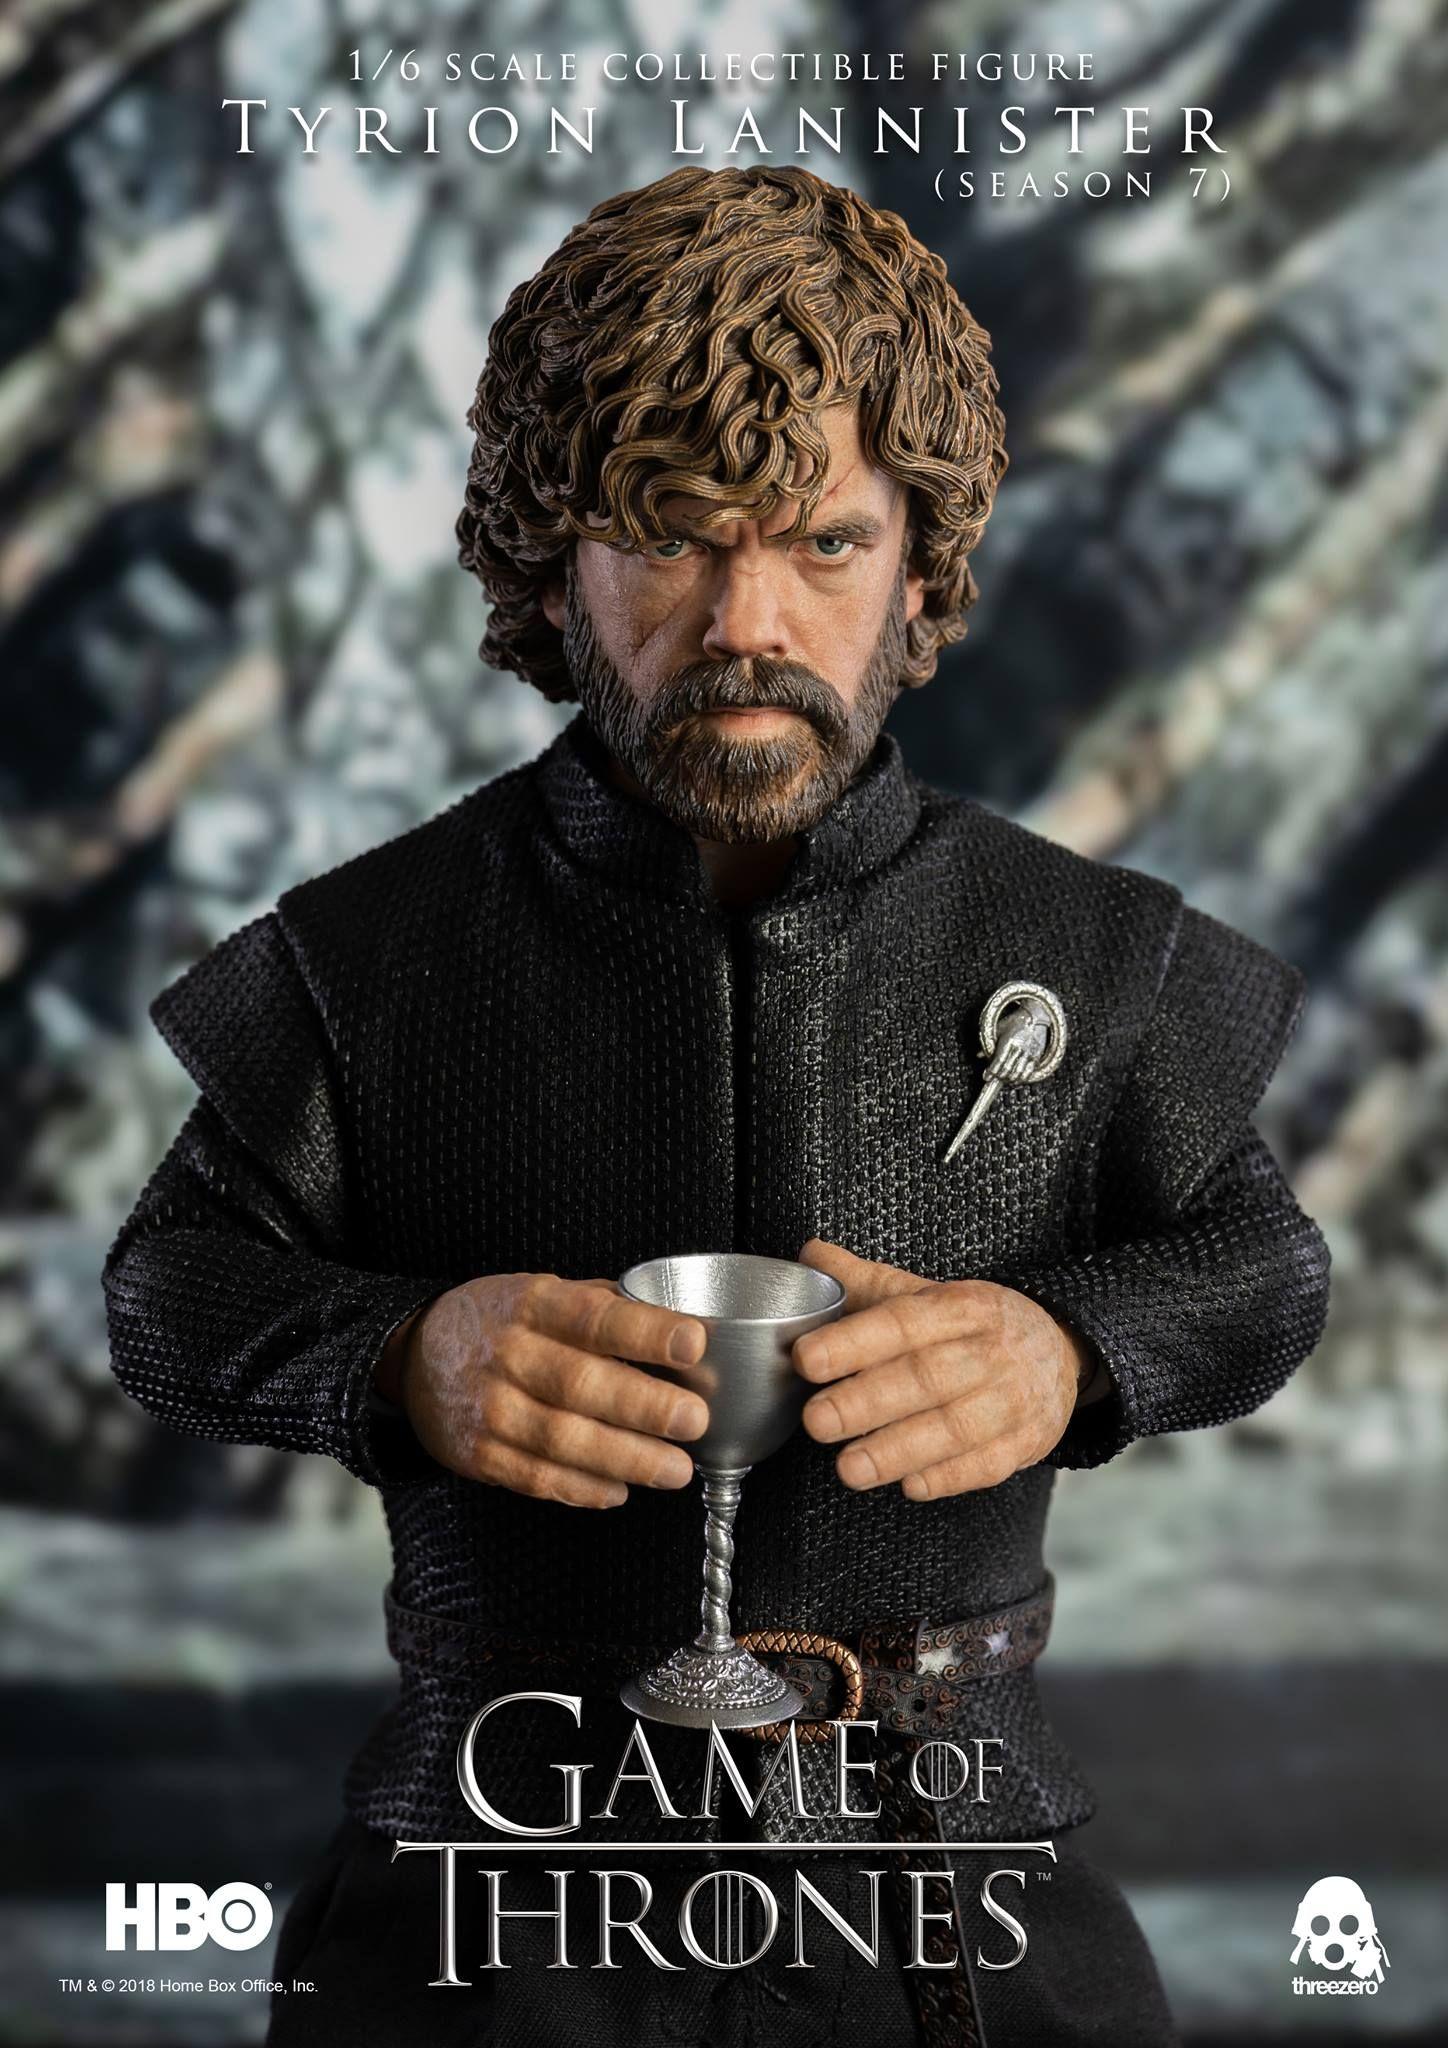 Season 7 Deluxe Version 1//6 Threezero HBO Game of Thrones GOT Tyrion Lannister